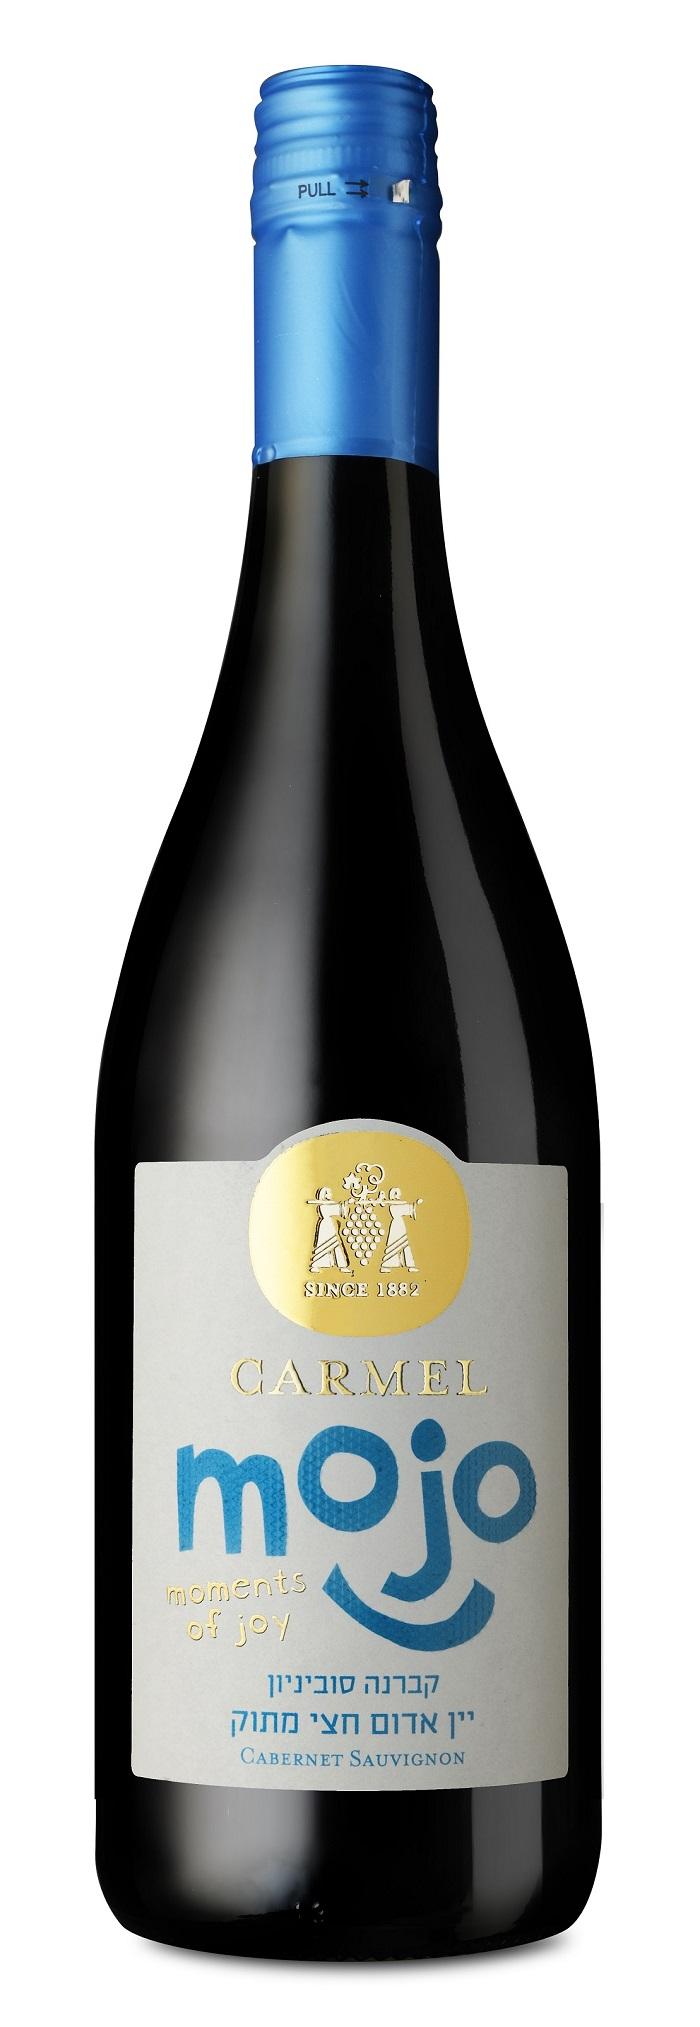 mojo יקבי כרמל משיקים סדרת יינות חדשה MOJO צילום אייל קרן מחיר מומלץ לצרכן 35 שקל